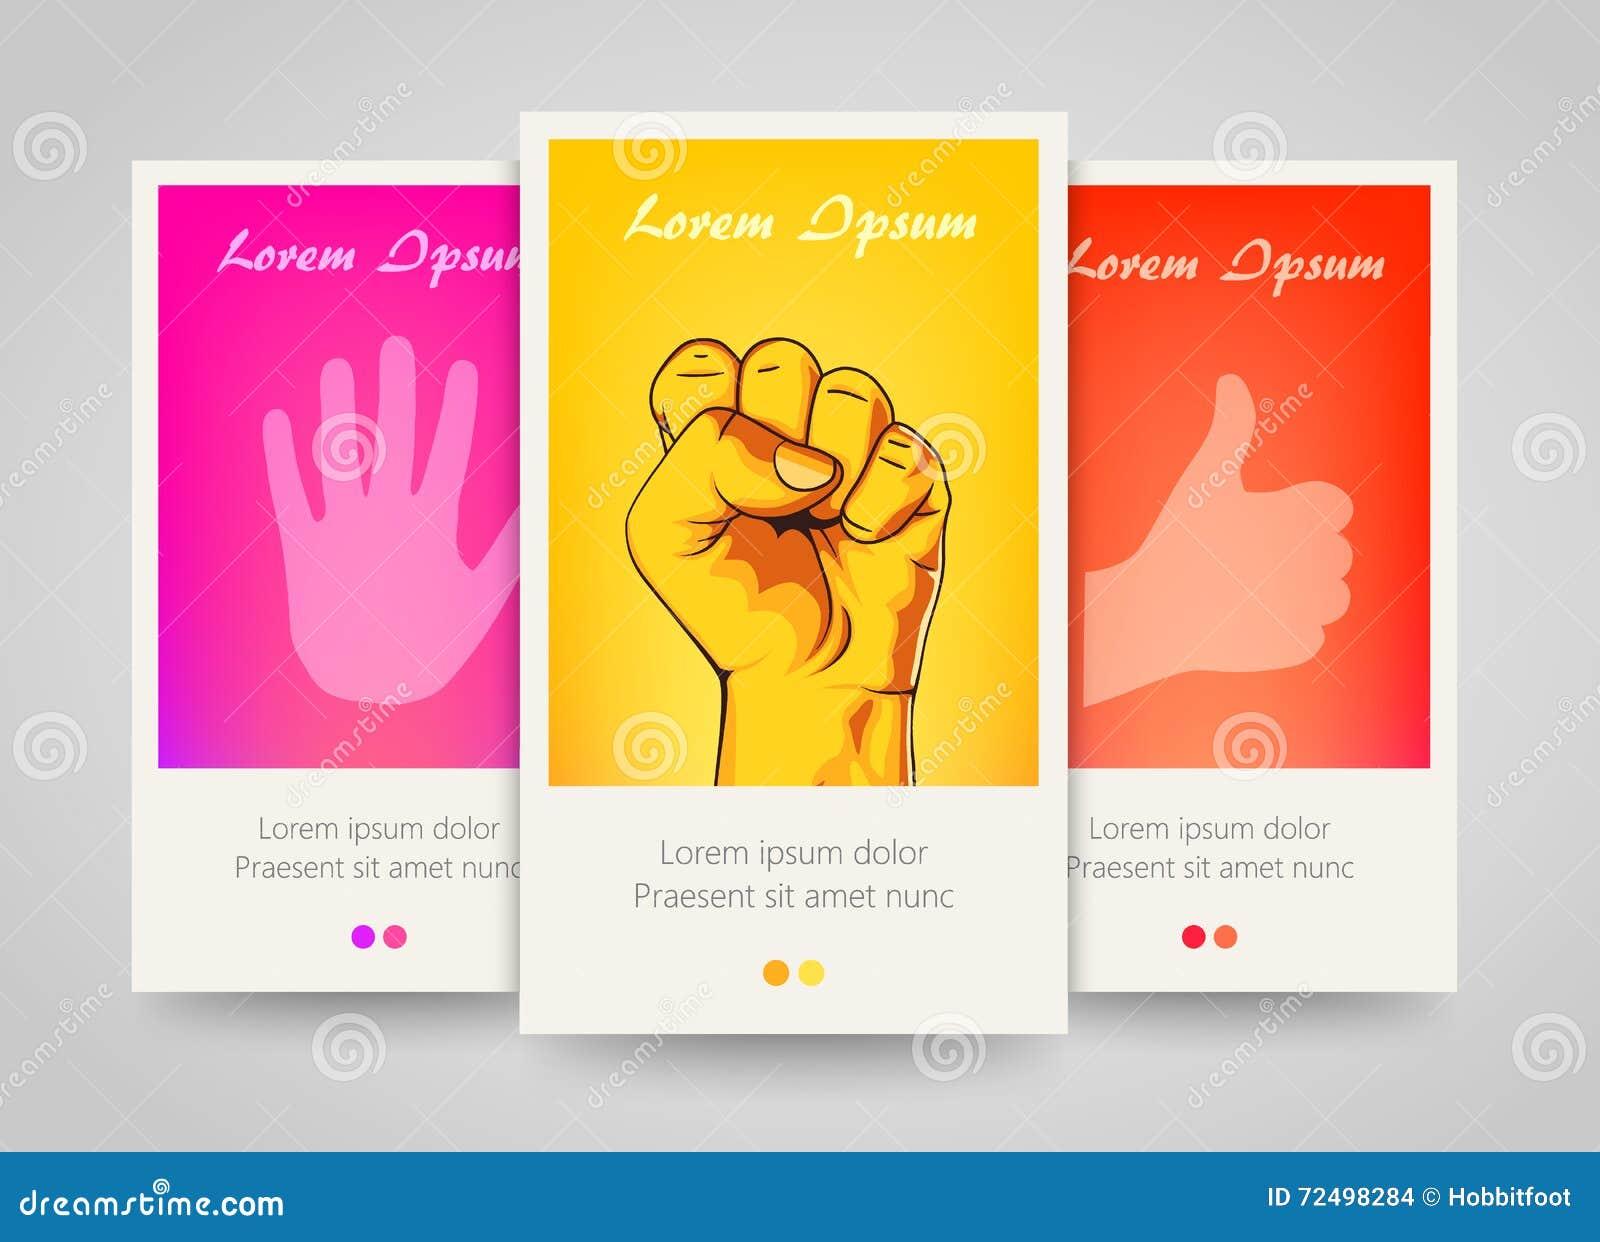 Propaganda Banners Trade Show Design Banners